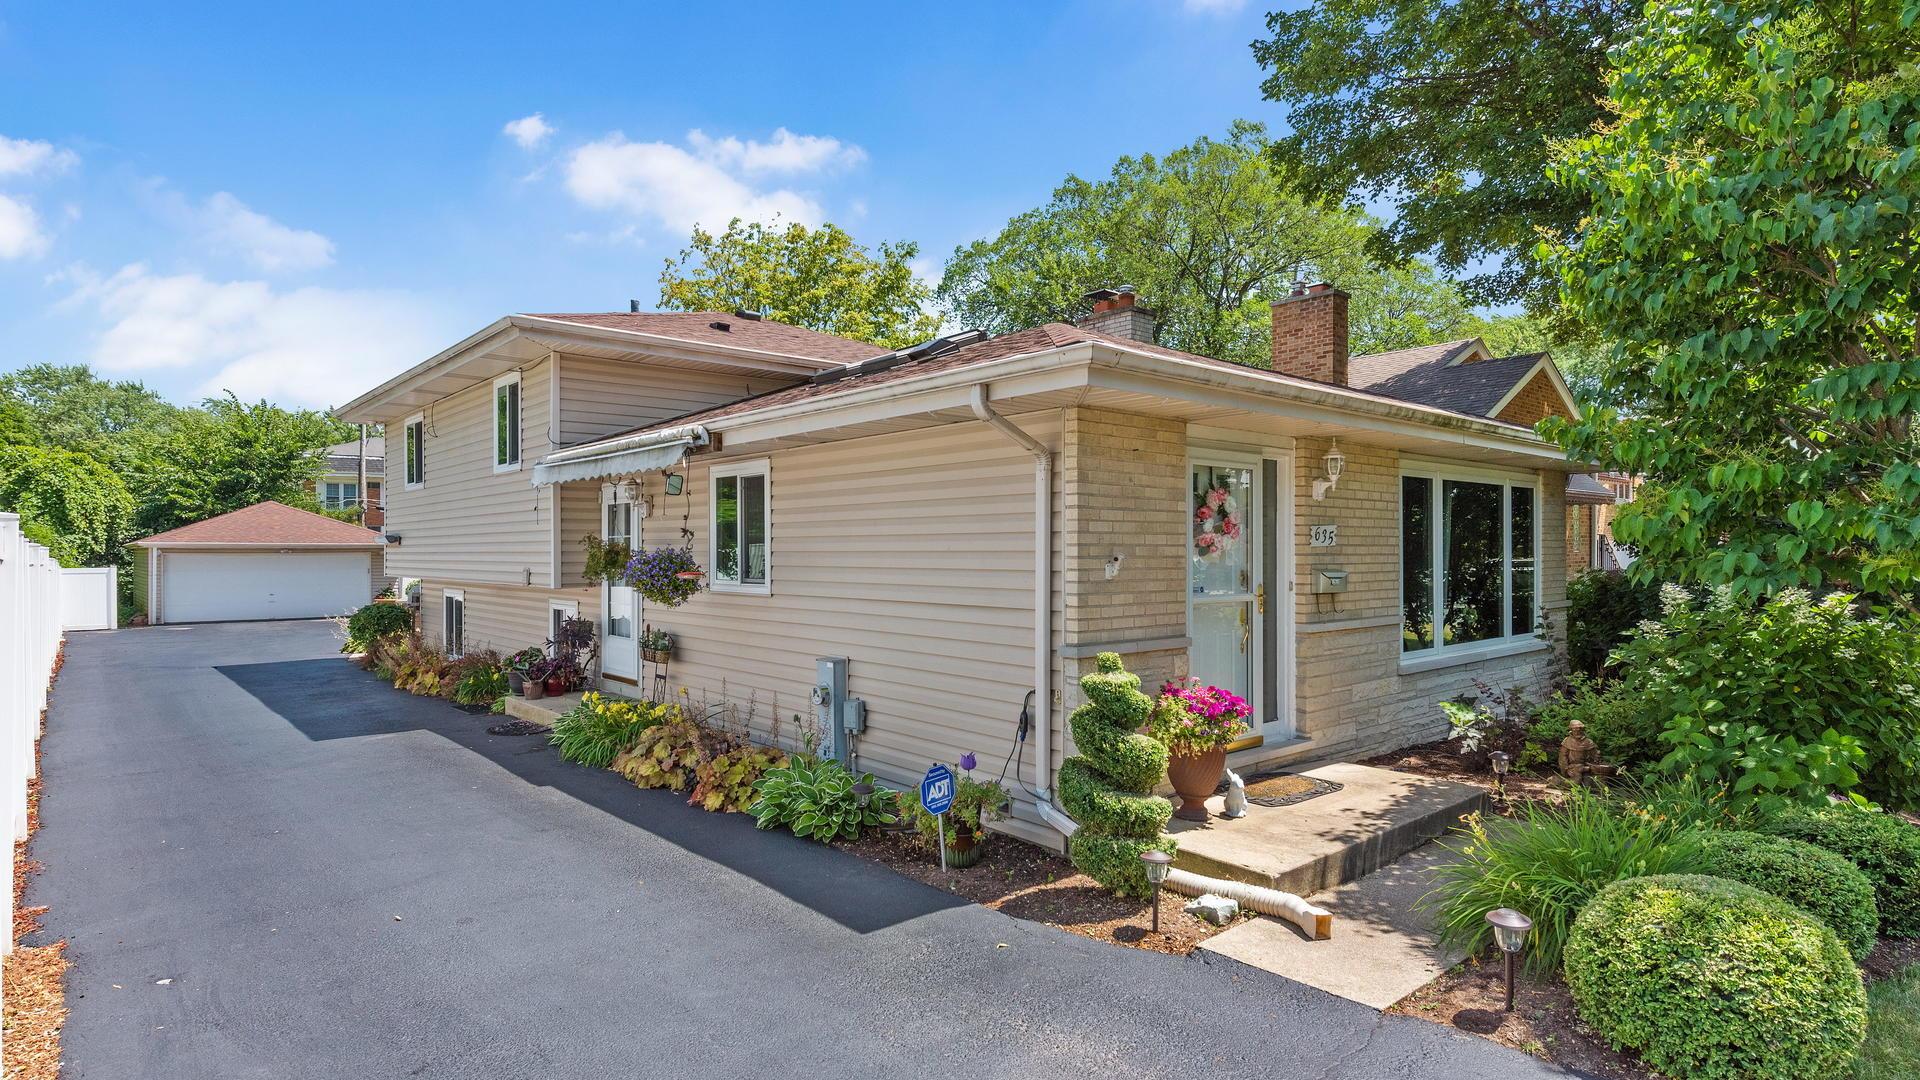 635 Highview ,Addison, Illinois 60101